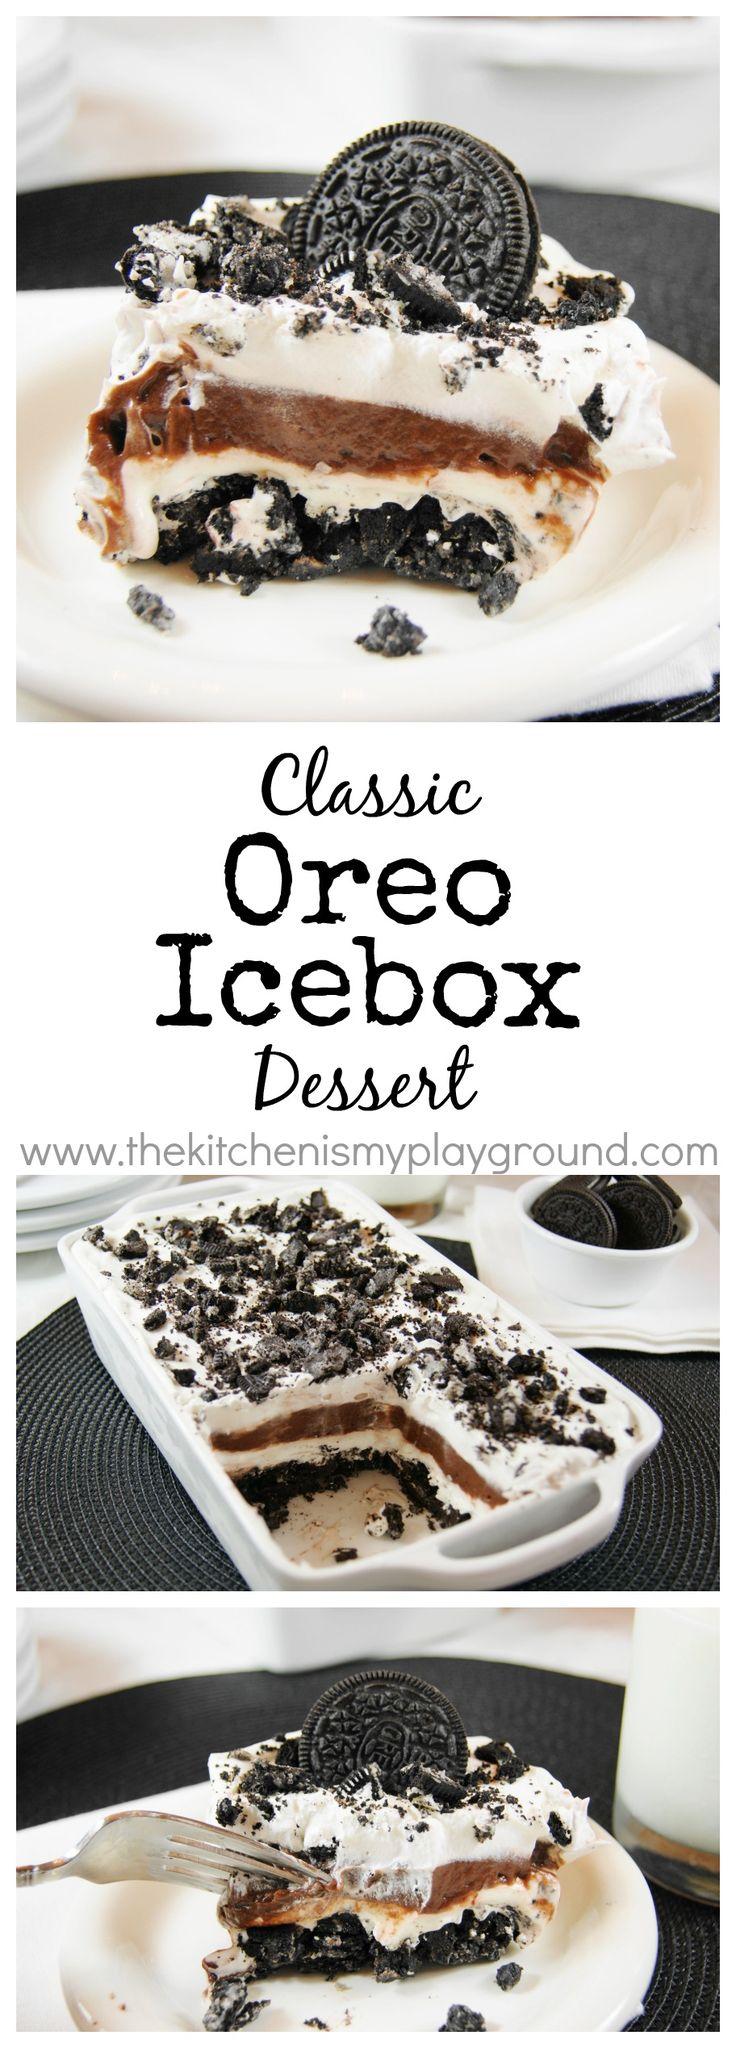 Classic Oreo Icebox Dessert ~ creamy chocolate comfort in a pan! www.thekitchenismyplayground.com